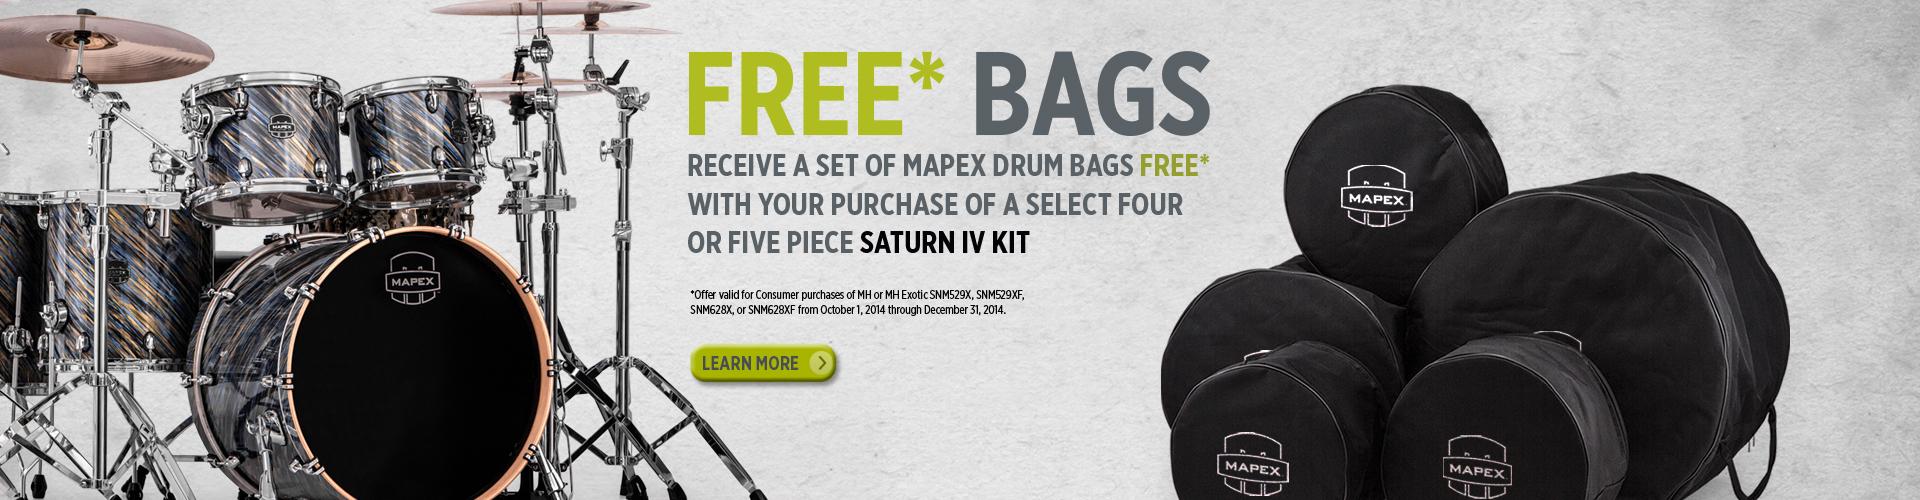 Free Saturn Bags